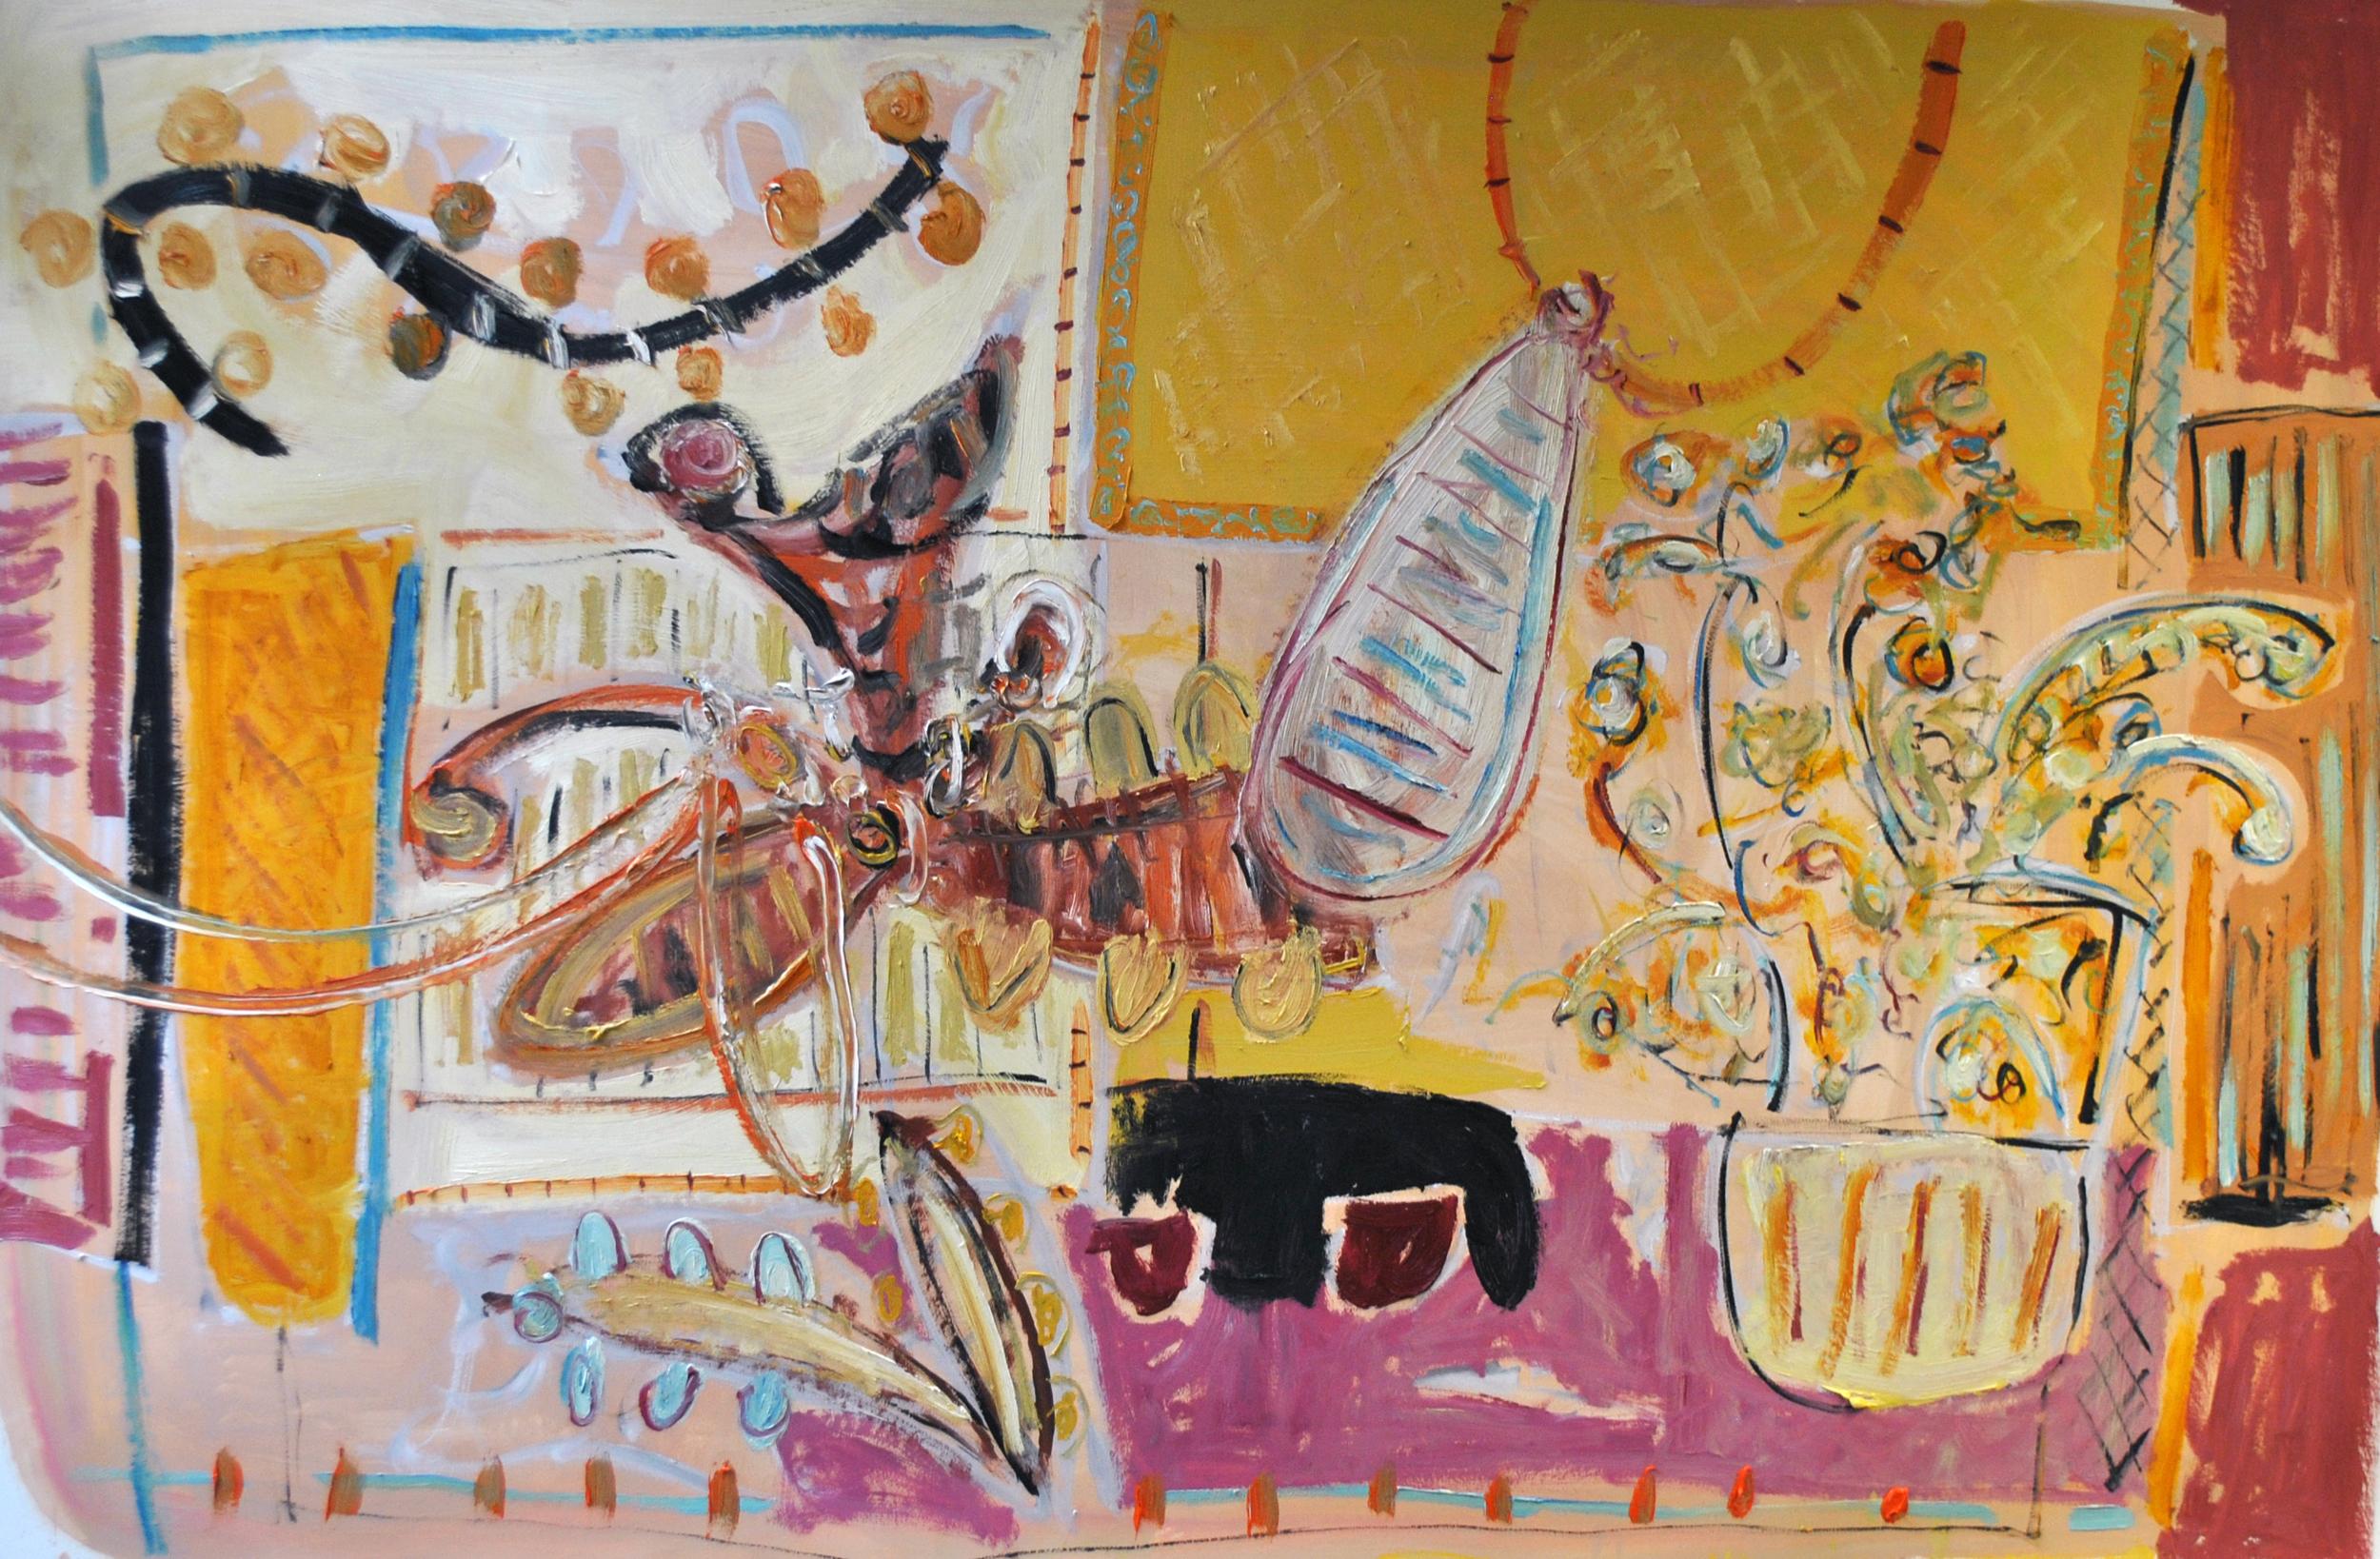 Alec  Cumming, Swing Kicks, oil on paper, 91x138cm,2015.jpg